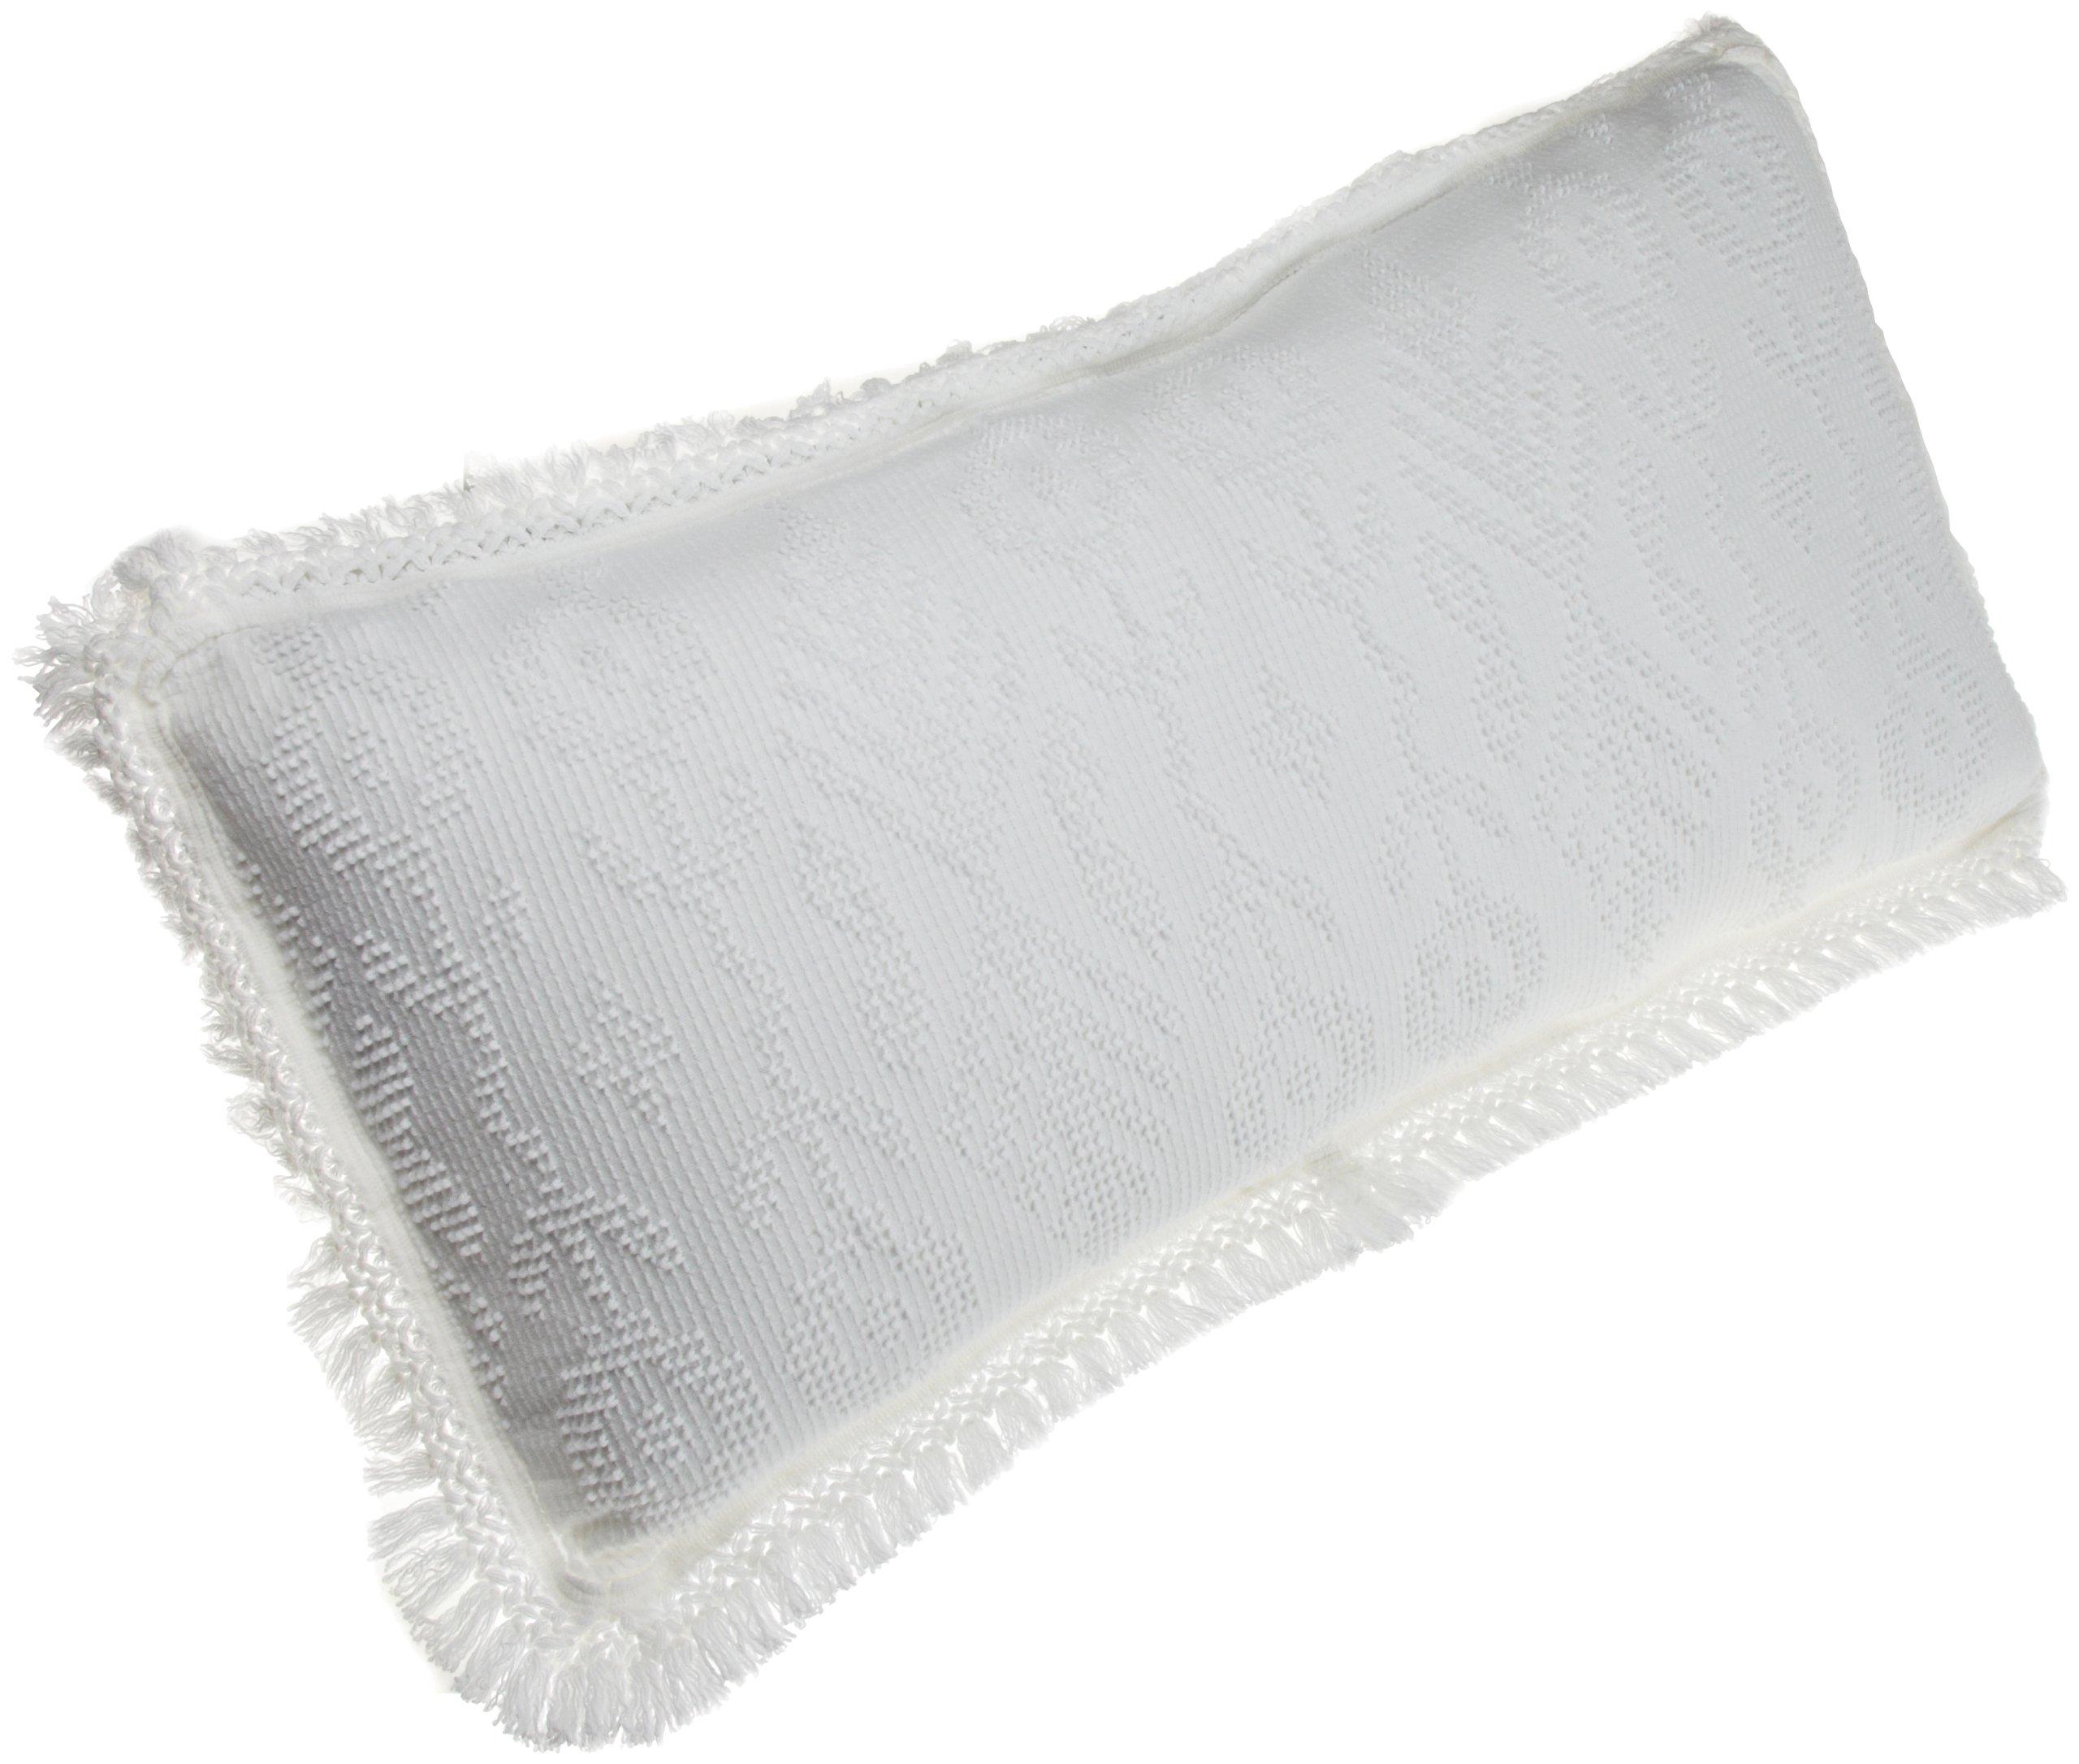 Maine Heritage 2153-KS-013 Weavers New England Tradition Cotton Pillow Sham